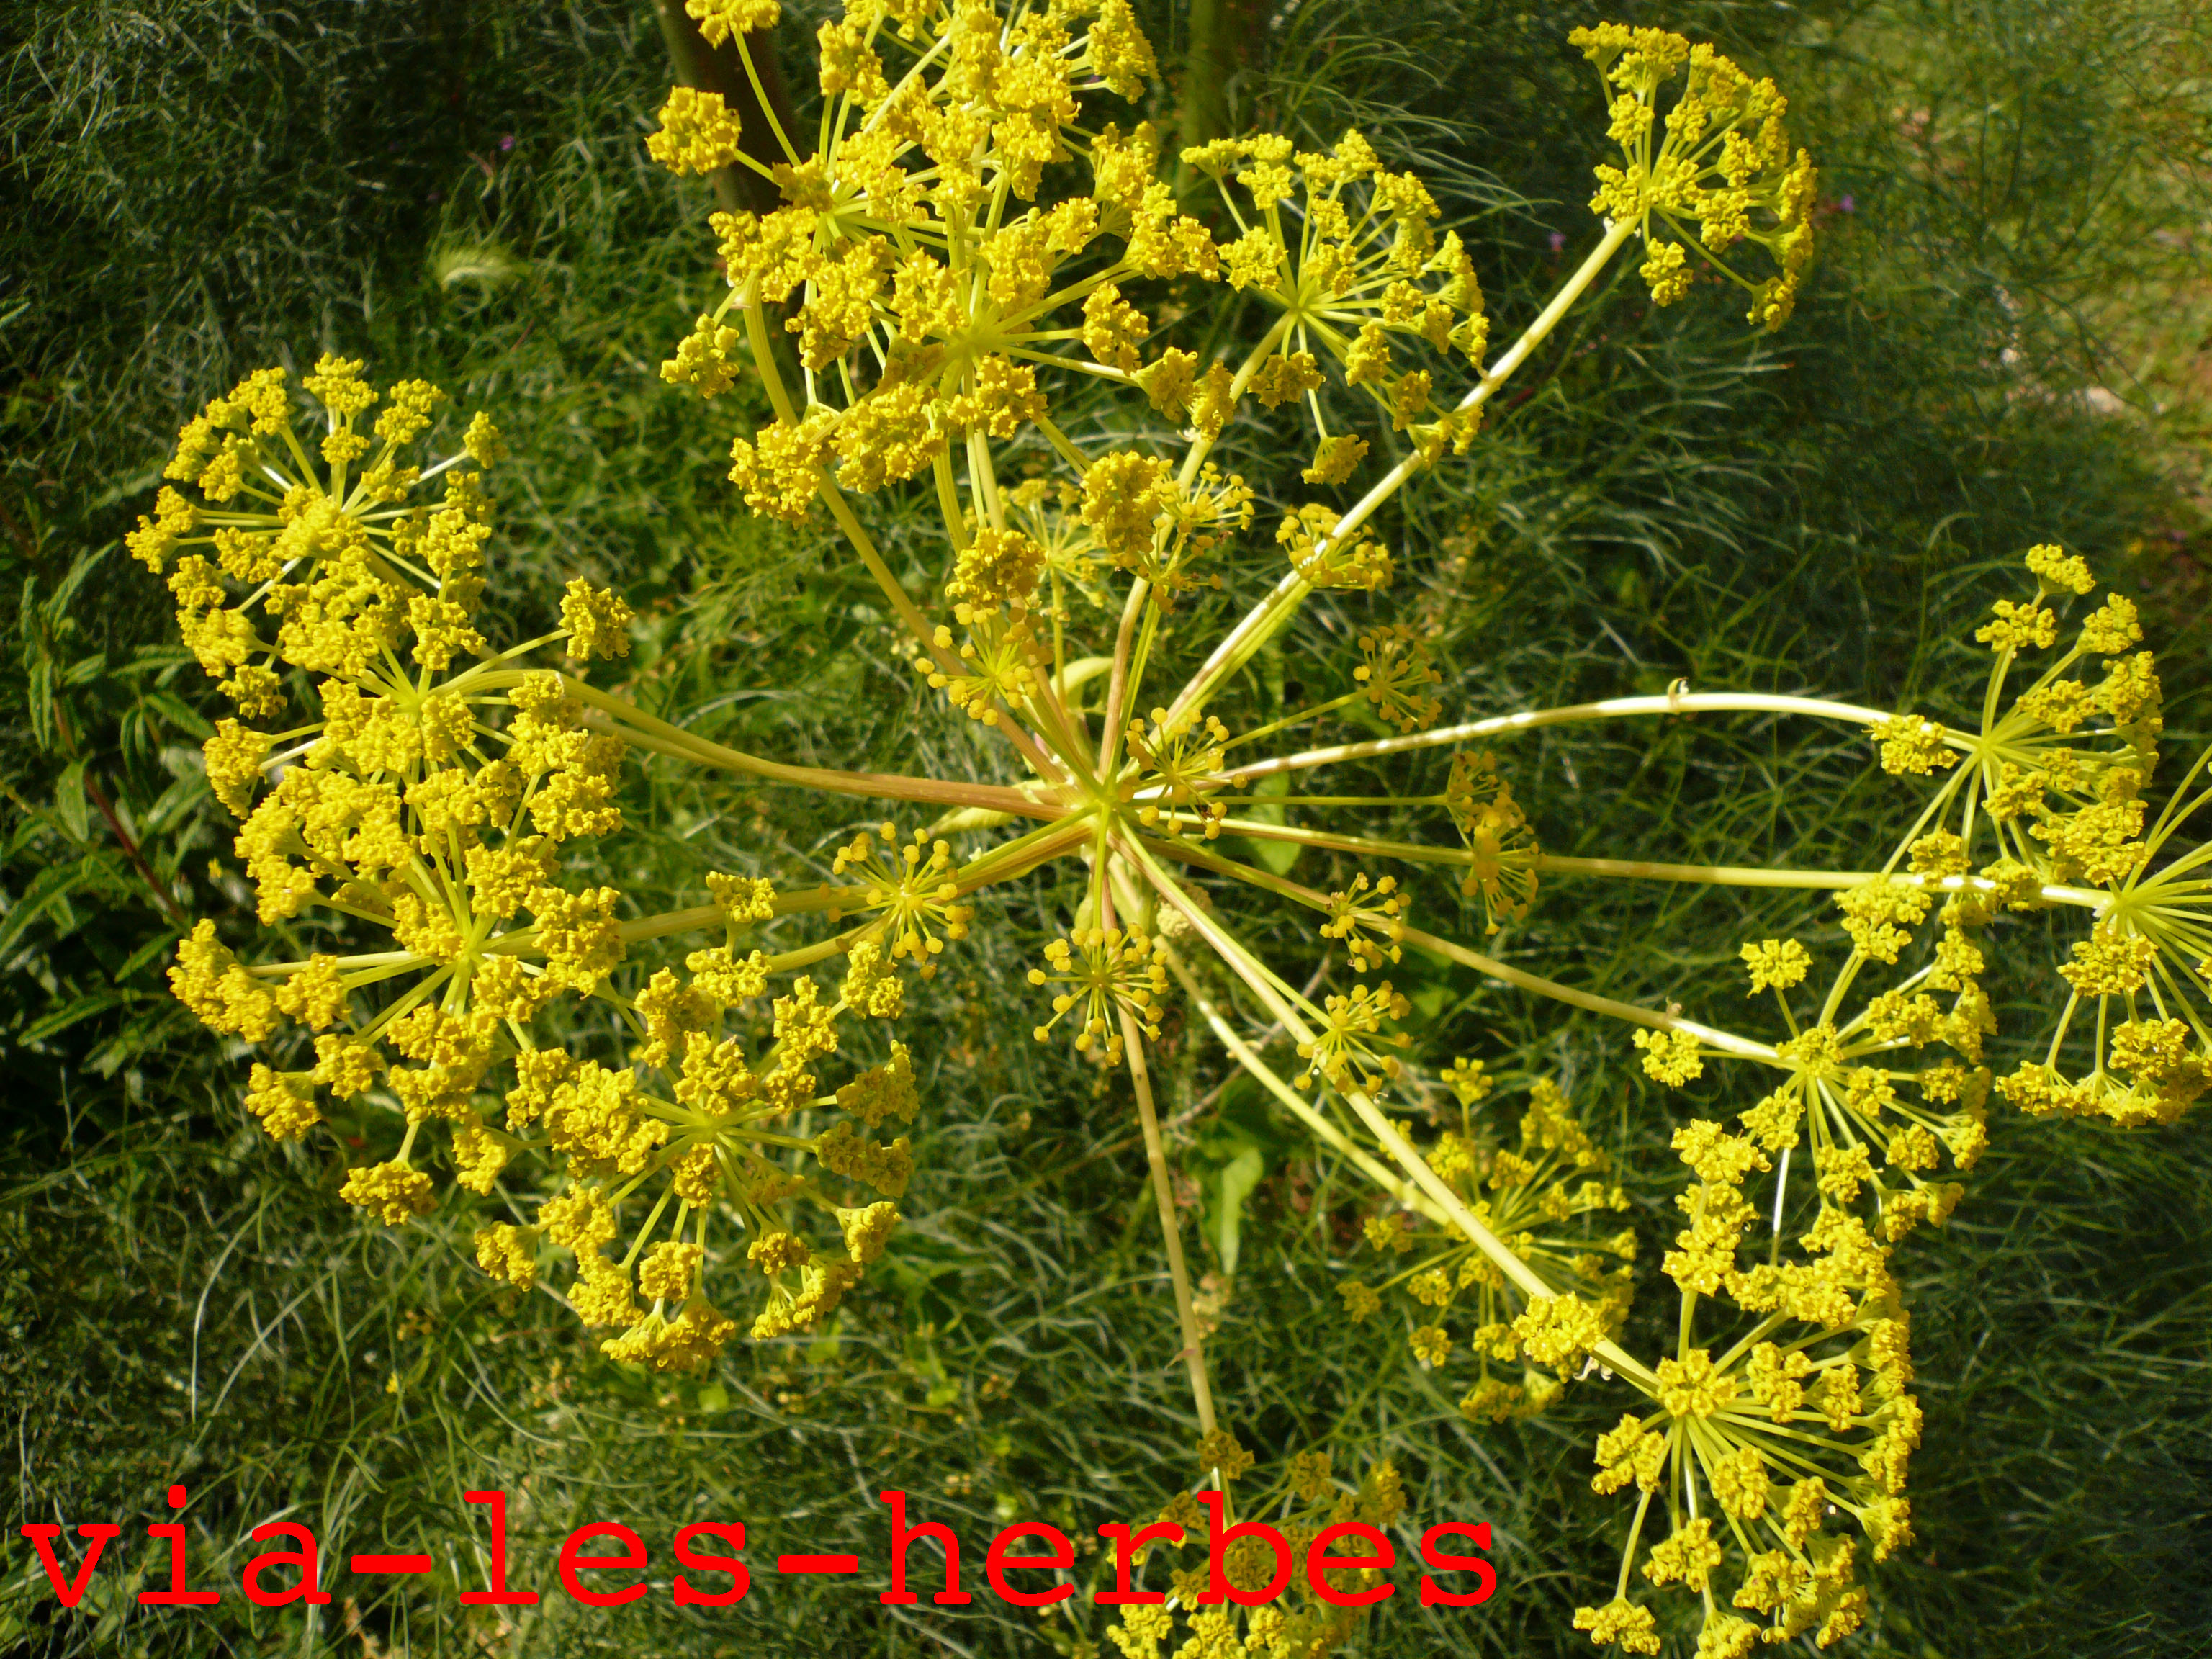 https://www.via-les-herbes.com/wp-content/uploads/2014/05/fleurs-de-ferule.jpg